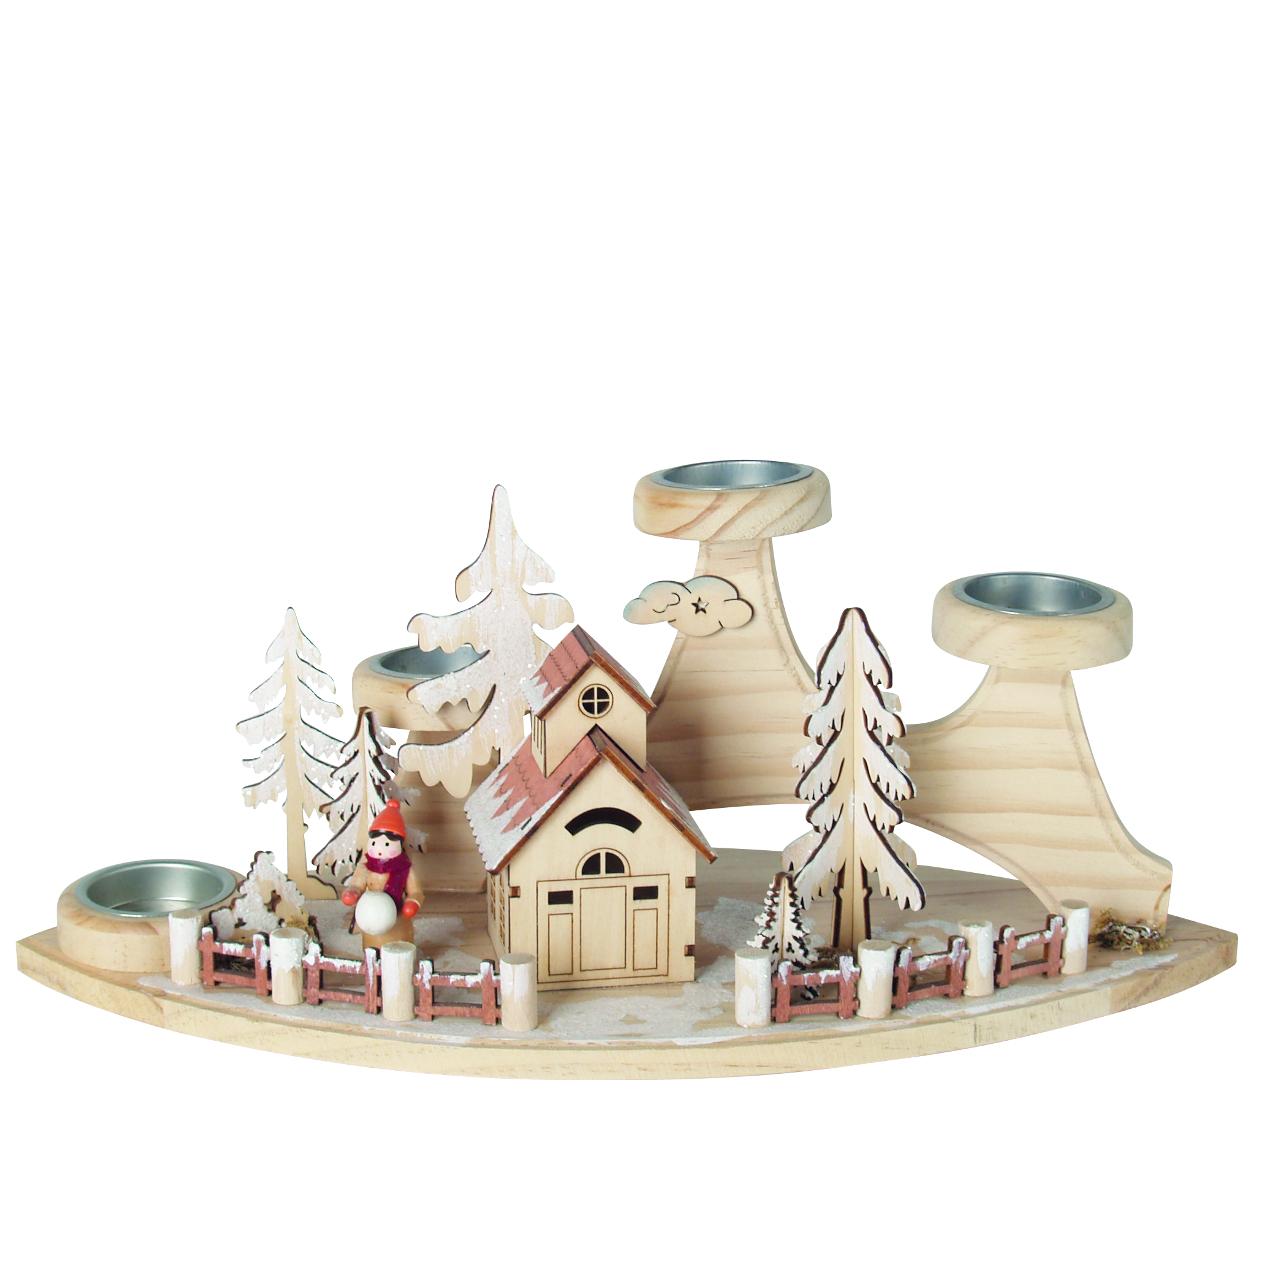 Teelichthalter haus in winterlandschaft holz natur - Winterlandschaft deko ...